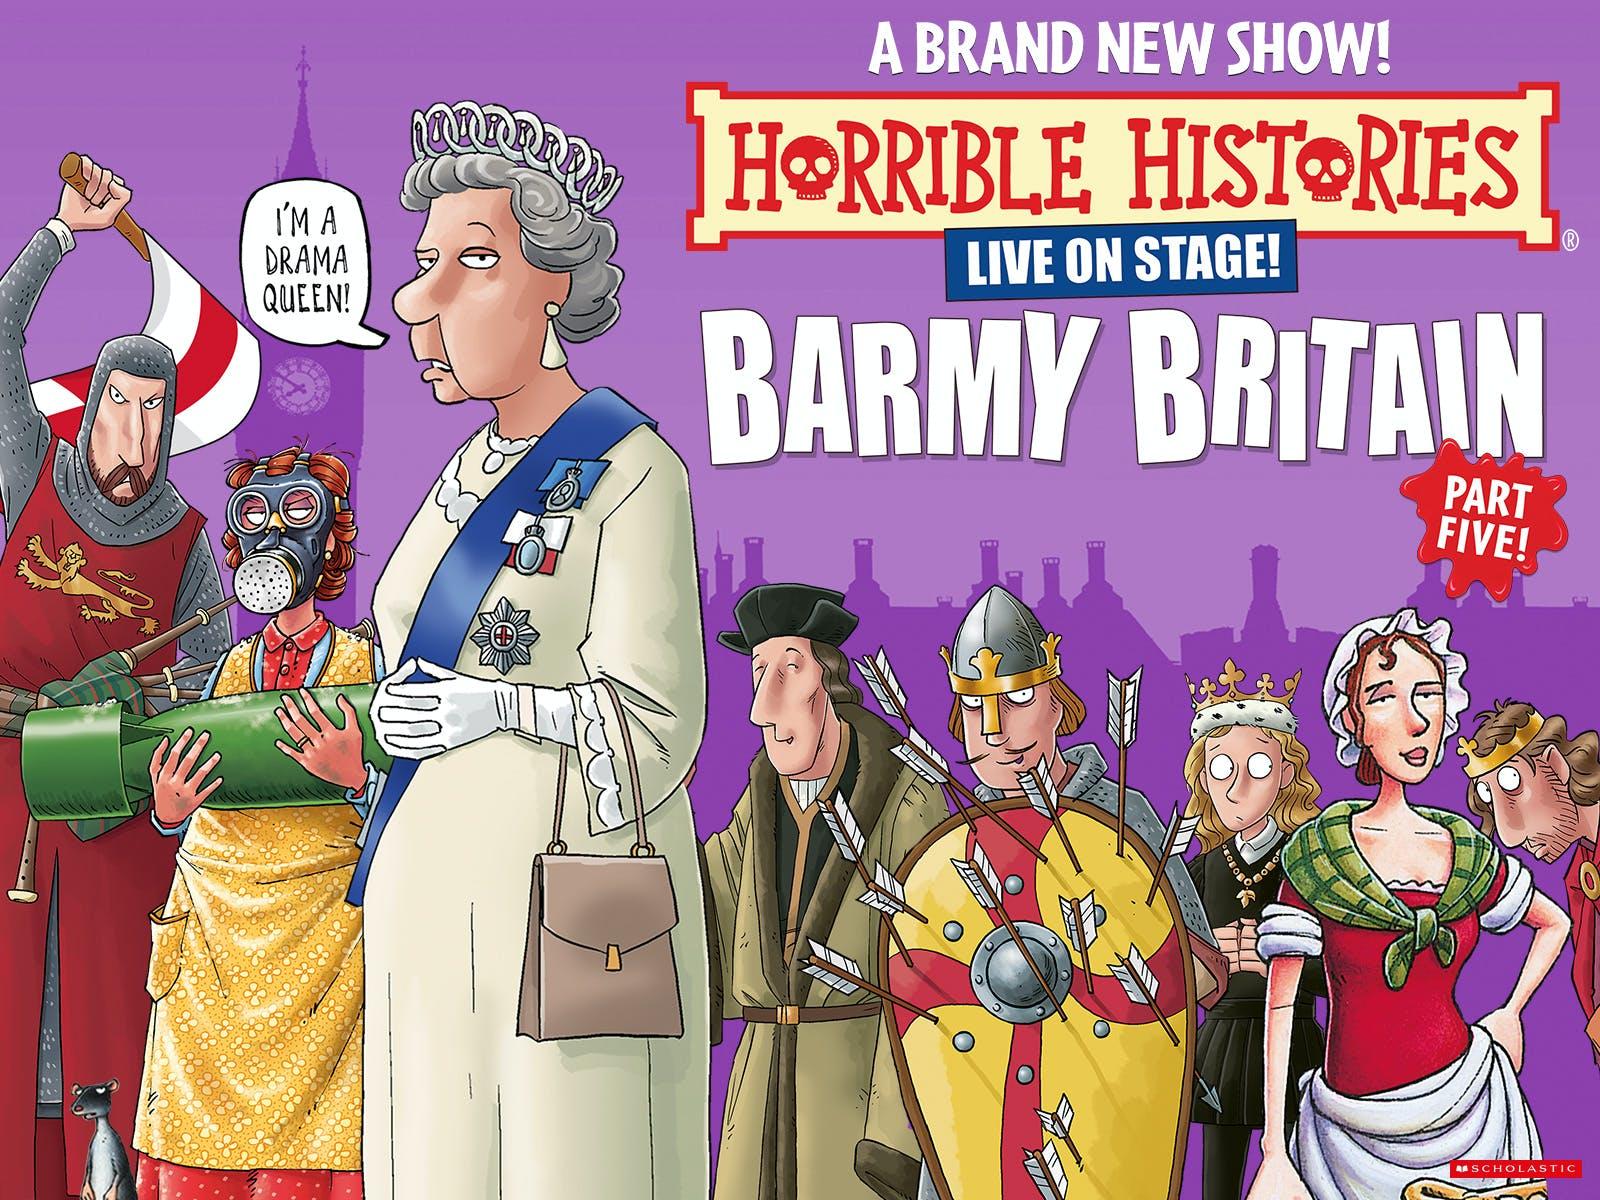 Horrible Histories - Barmy Britain - Part Five!